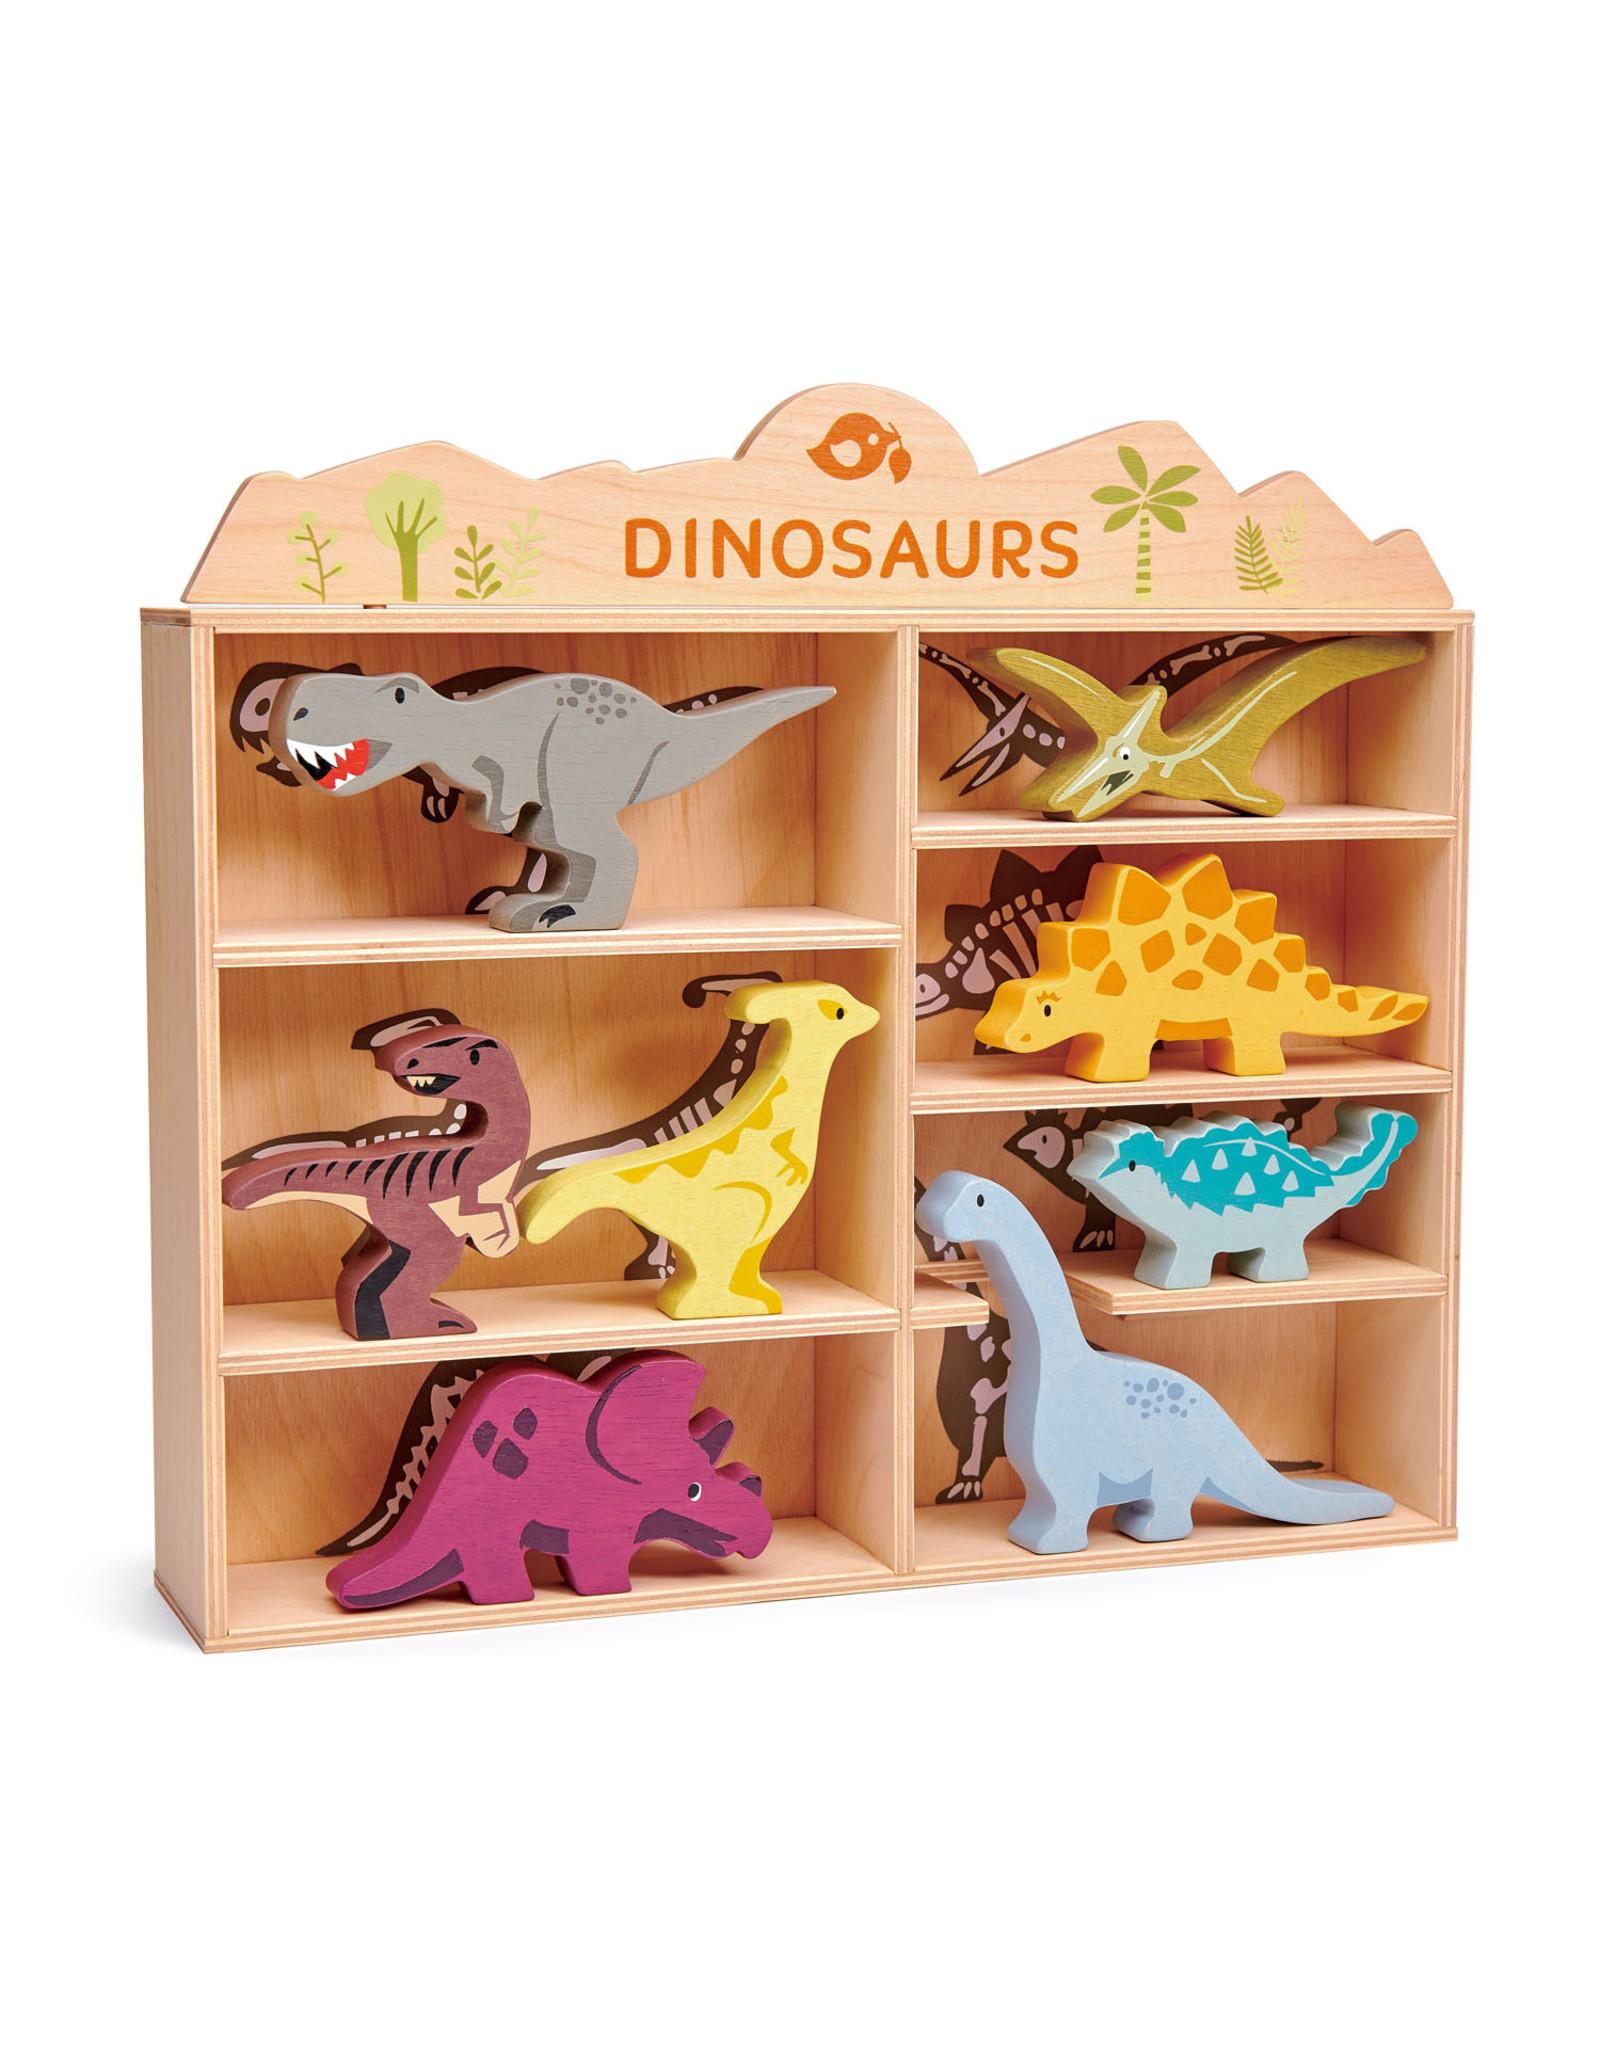 Tender Leaf Toys Dinosaurs - T-Rex